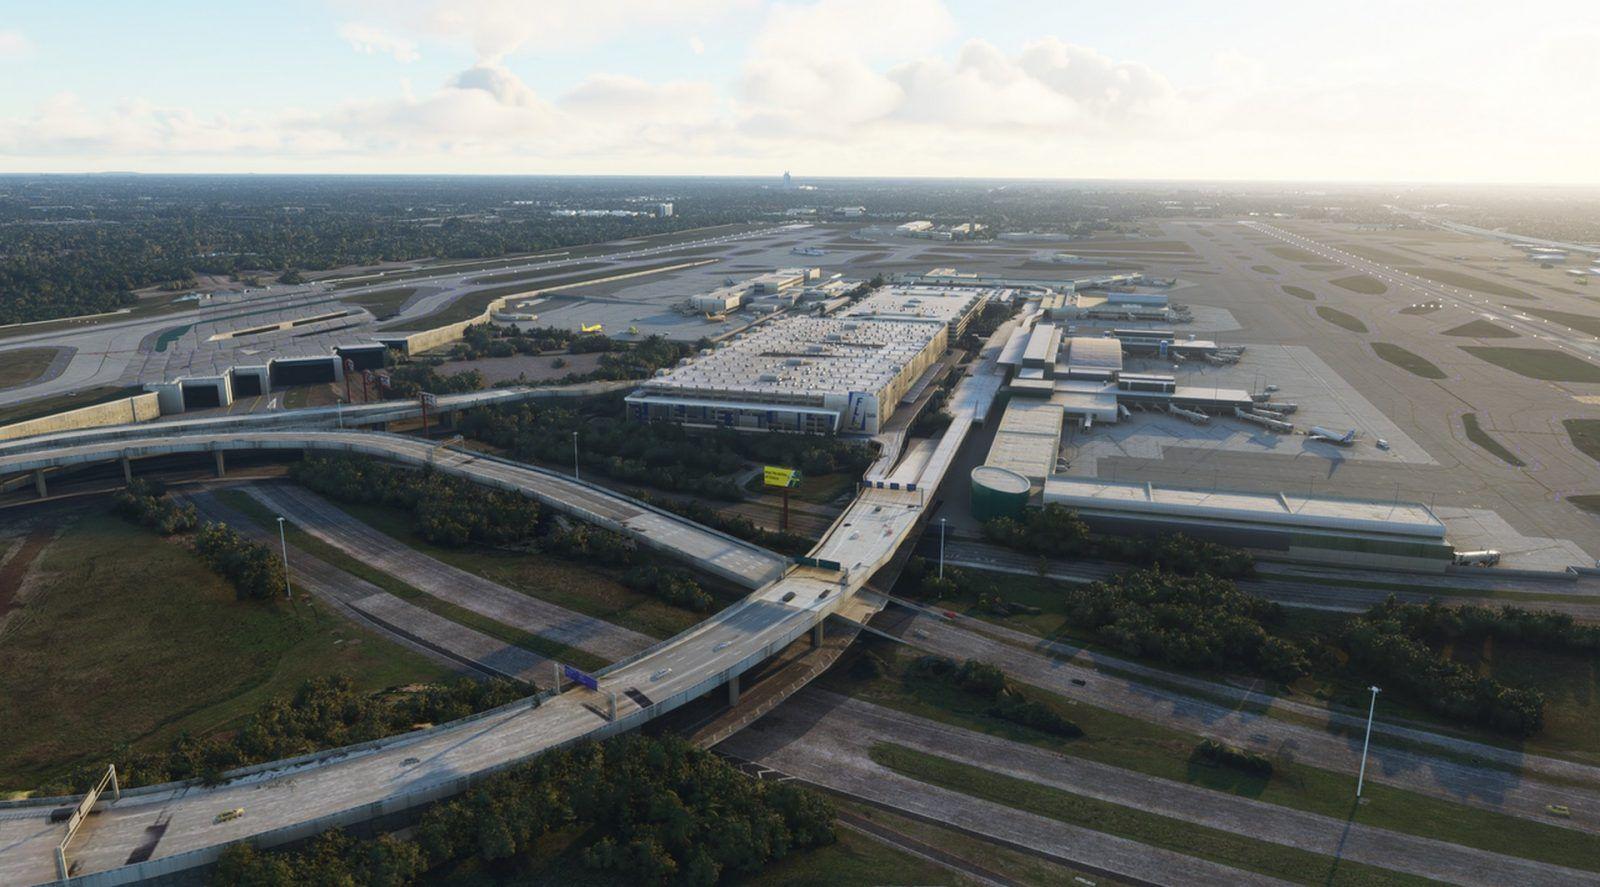 MSFS KFLL Fort Lauderdale–Hollywood International Airport